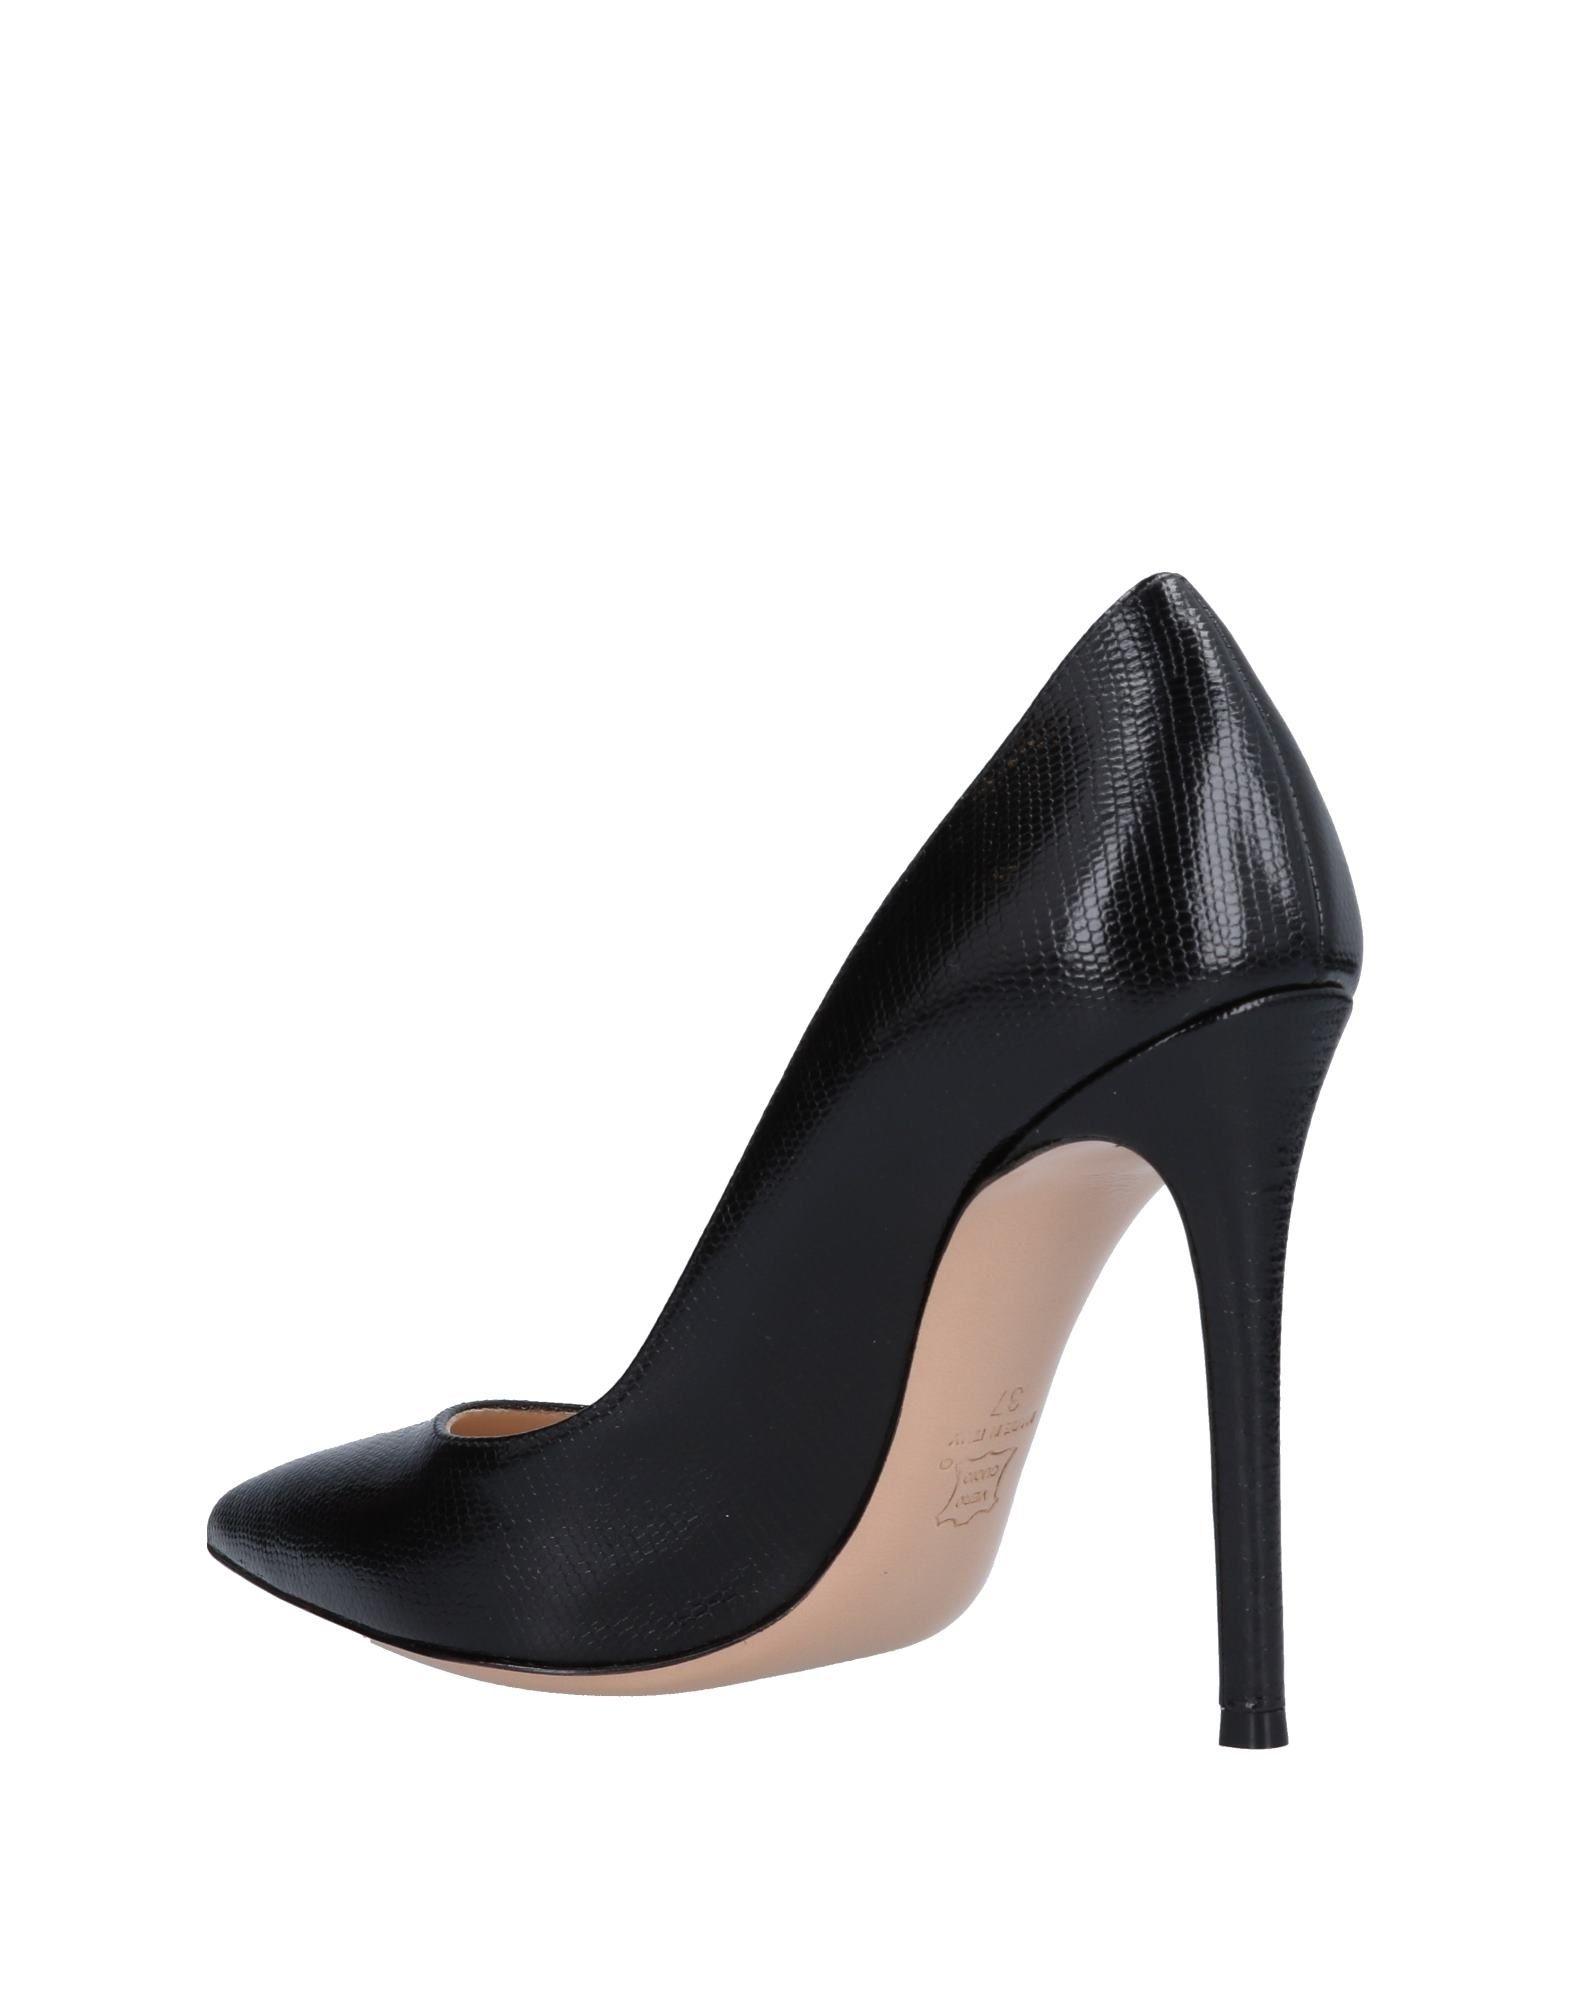 Lerre Pumps Damen  strapazierfähige 11499778QKGut aussehende strapazierfähige  Schuhe 7516e5